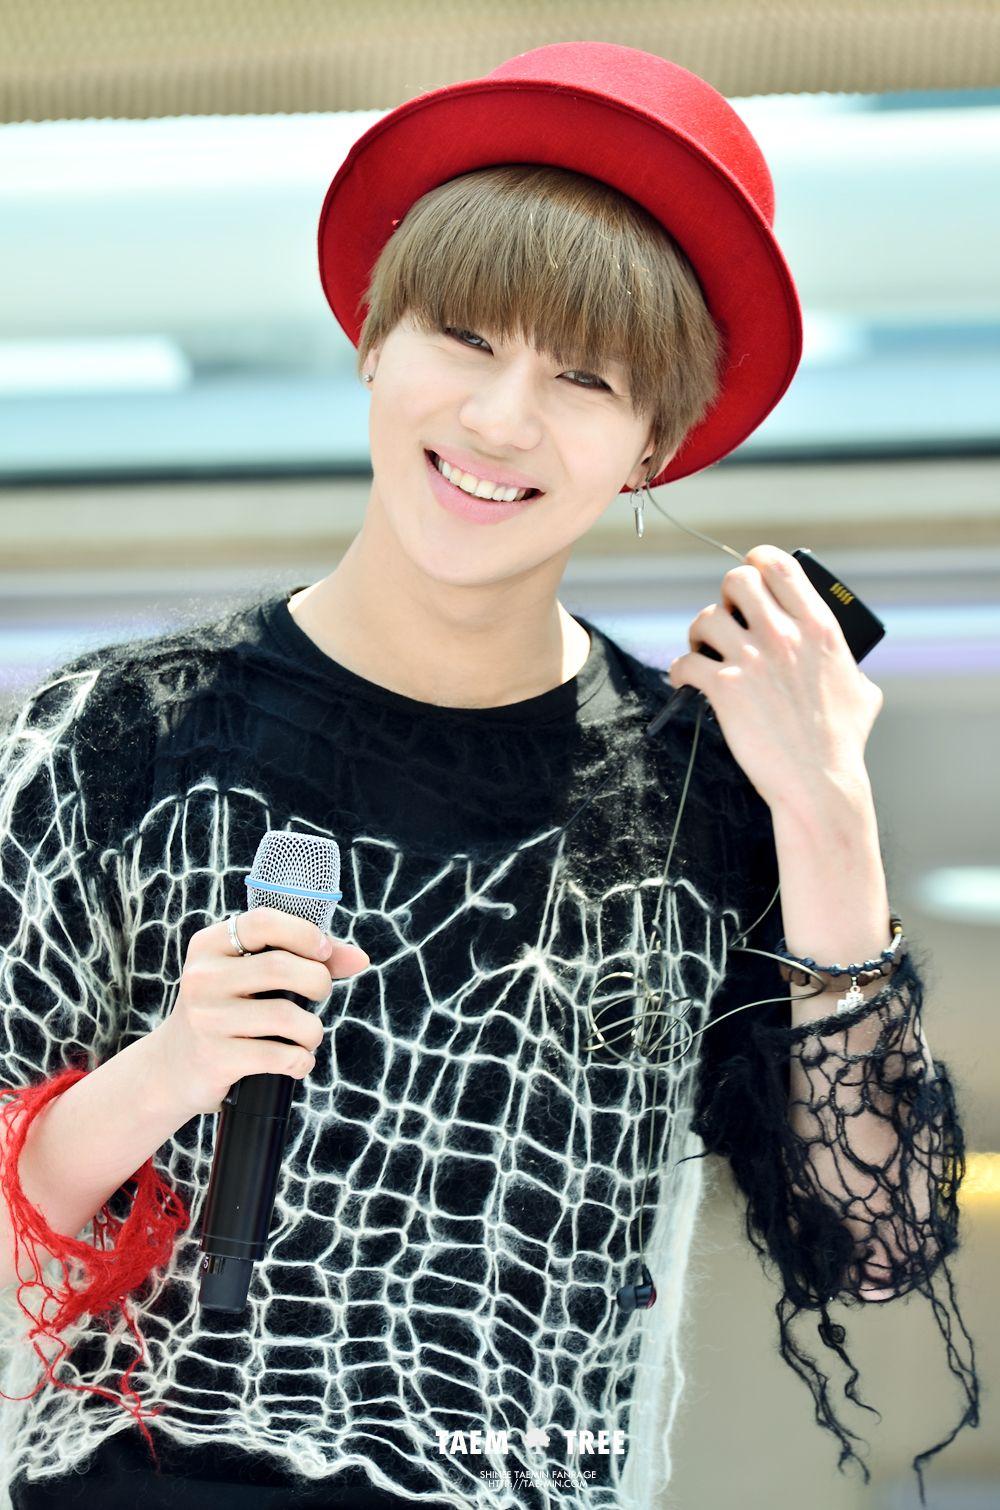 Why so serious shinee live jong hyun dating